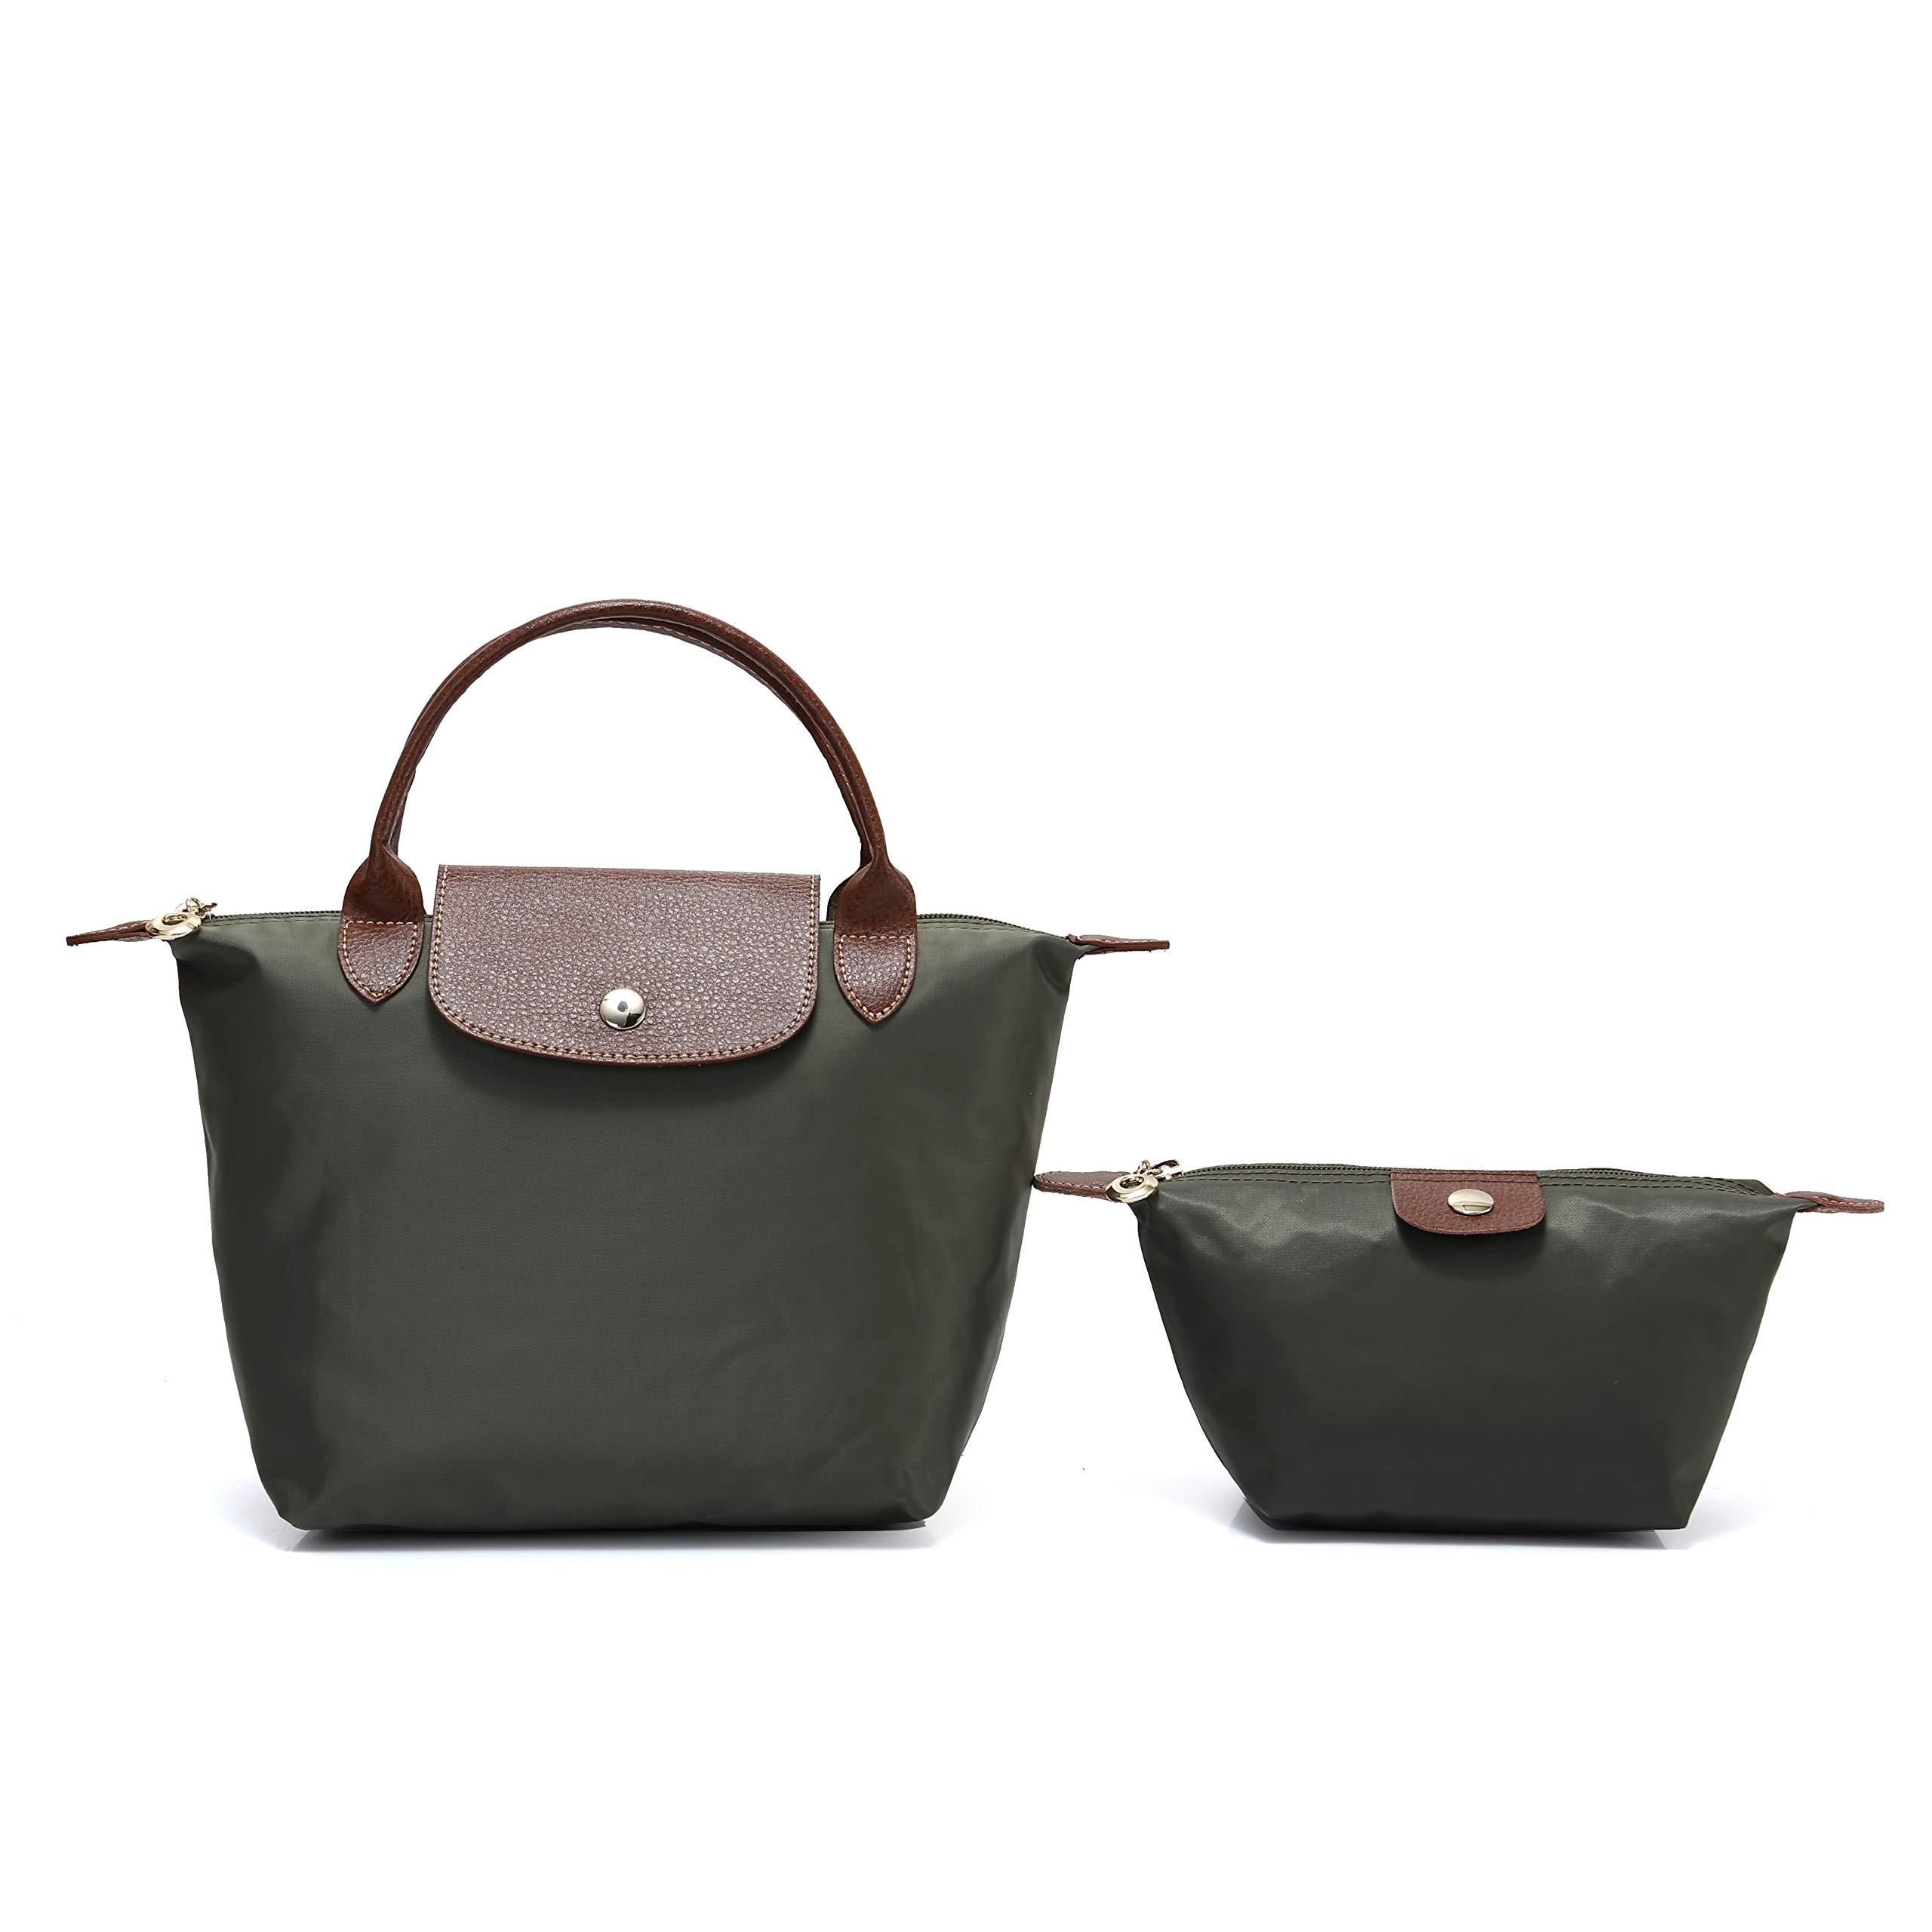 2 pcs Women's Stylish Waterproof Tote Bag Nylon Travel Shoulder Handbag (Army green;Mini number)